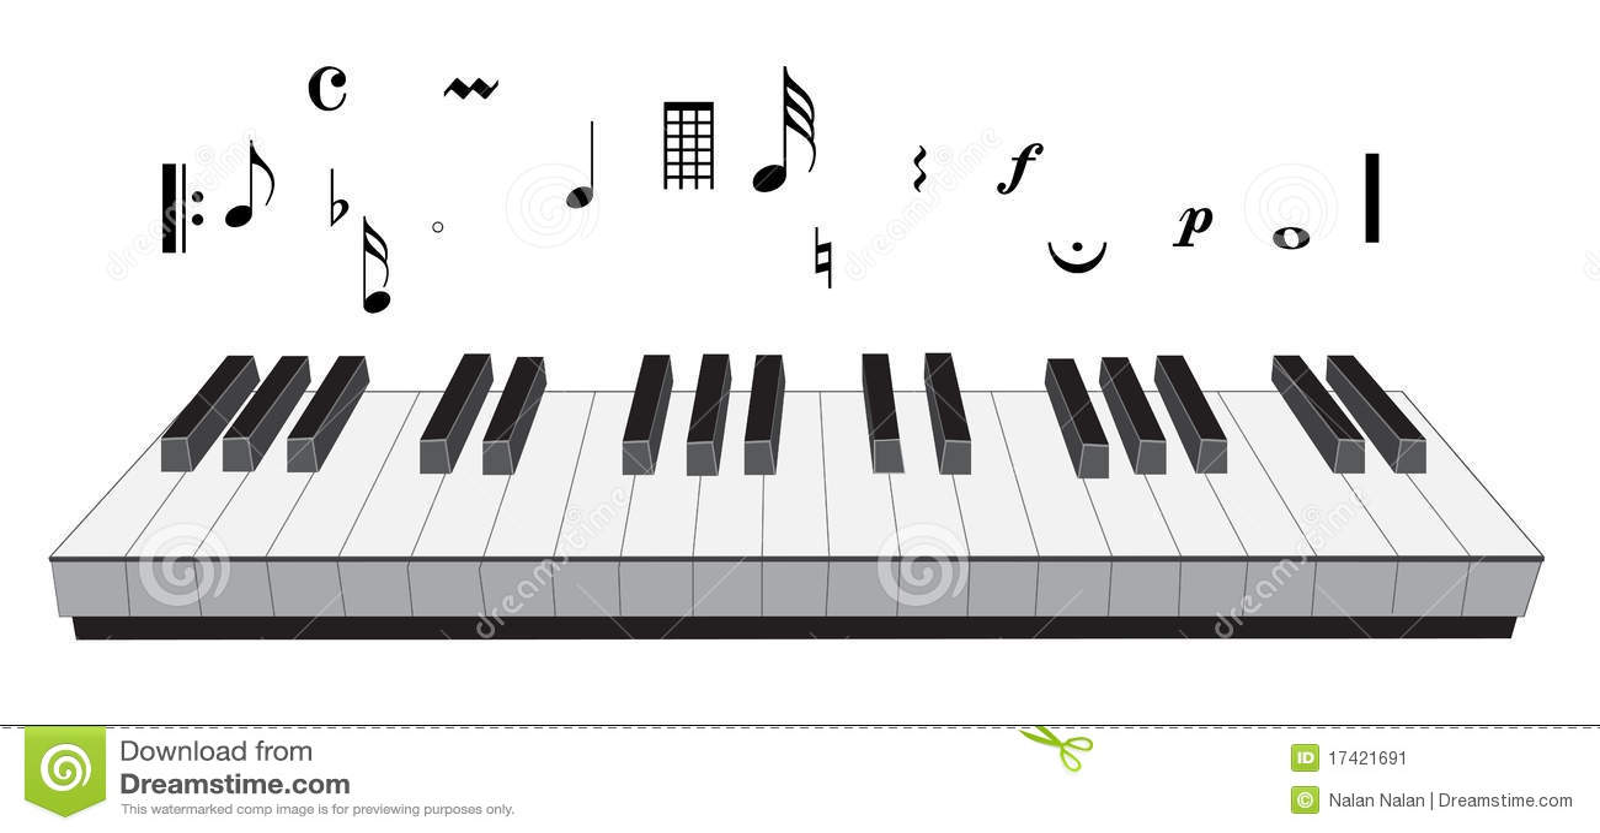 Que Representan Musica Simbolos Para Teclado Wwwimagenesmycom